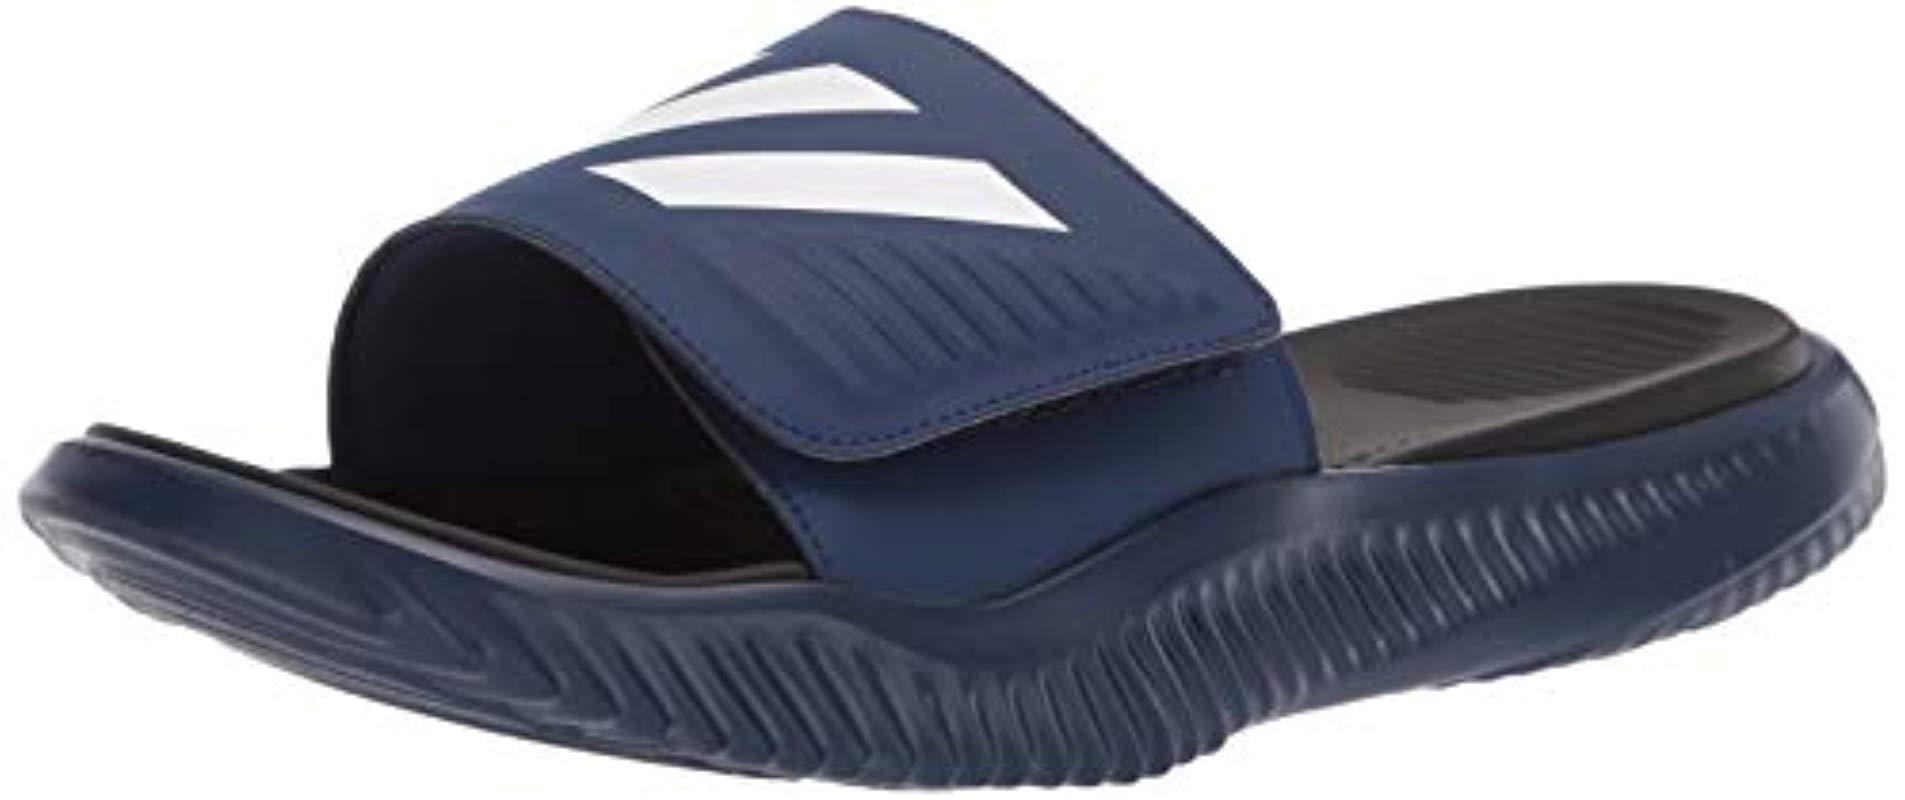 info for 78823 86005 adidas. Mens Blue Alphabounce Slide